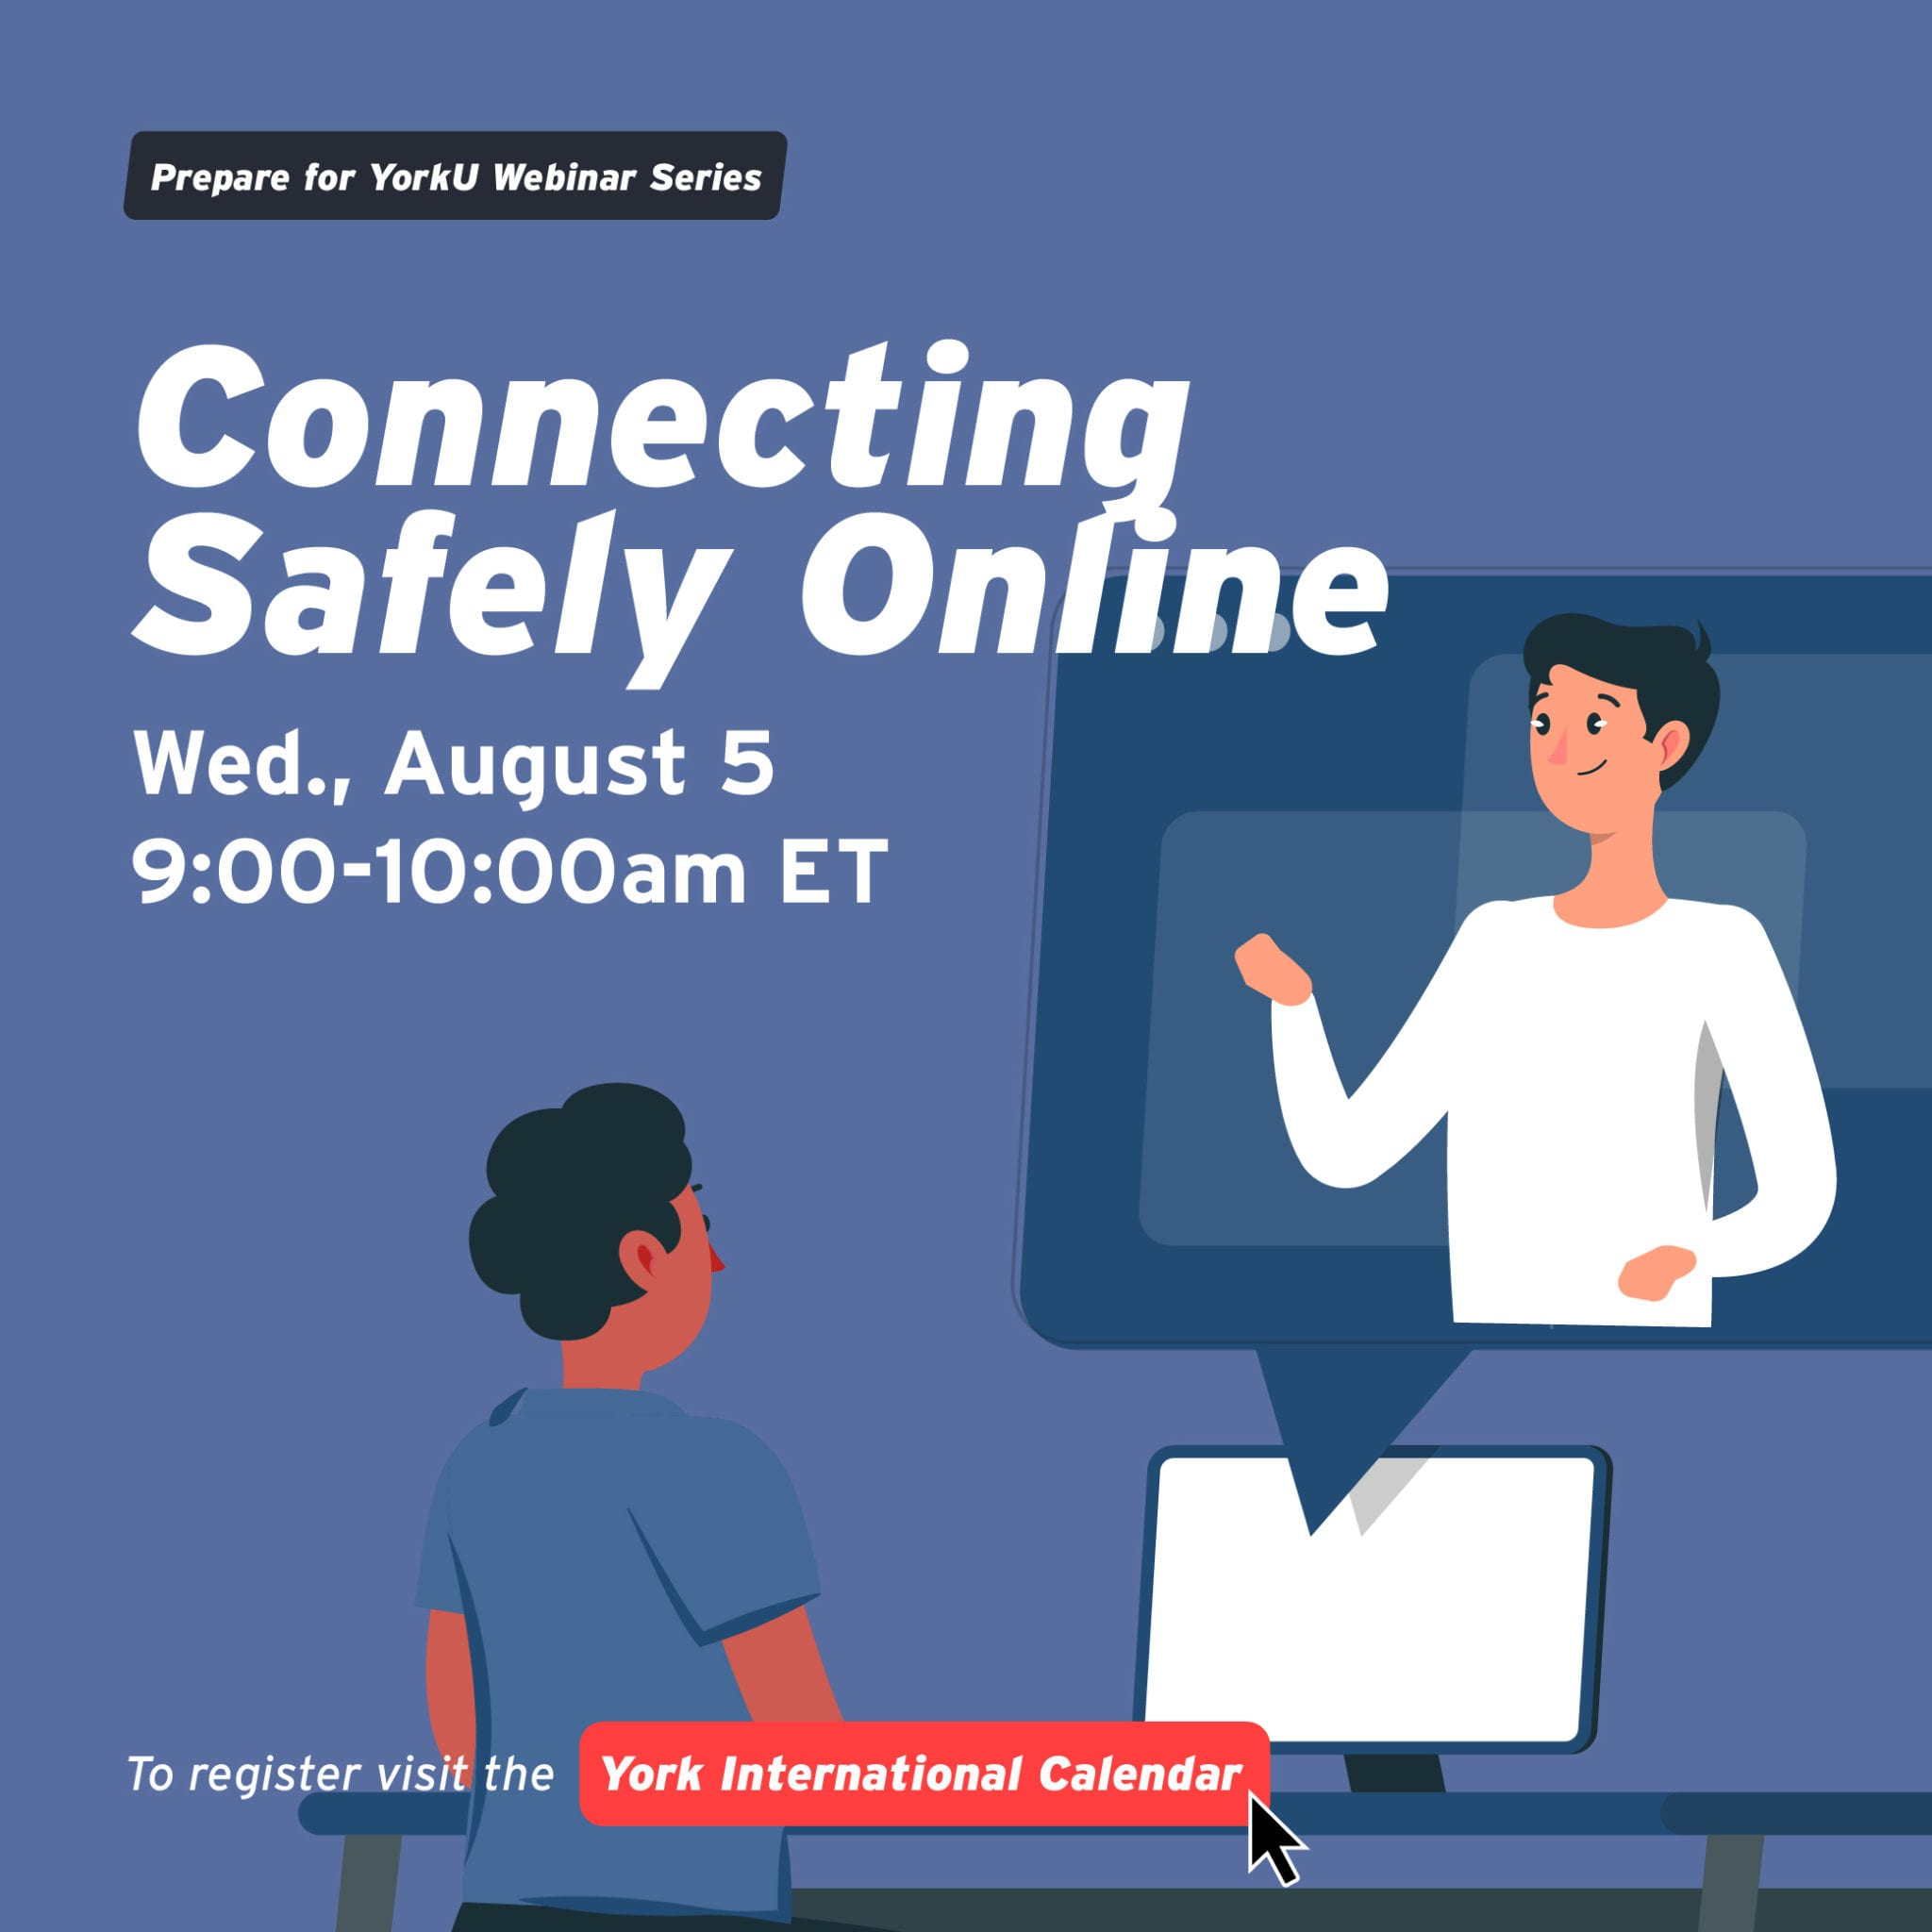 Prepare for YorkU Webinar: Connecting Safely Online @ Virtual